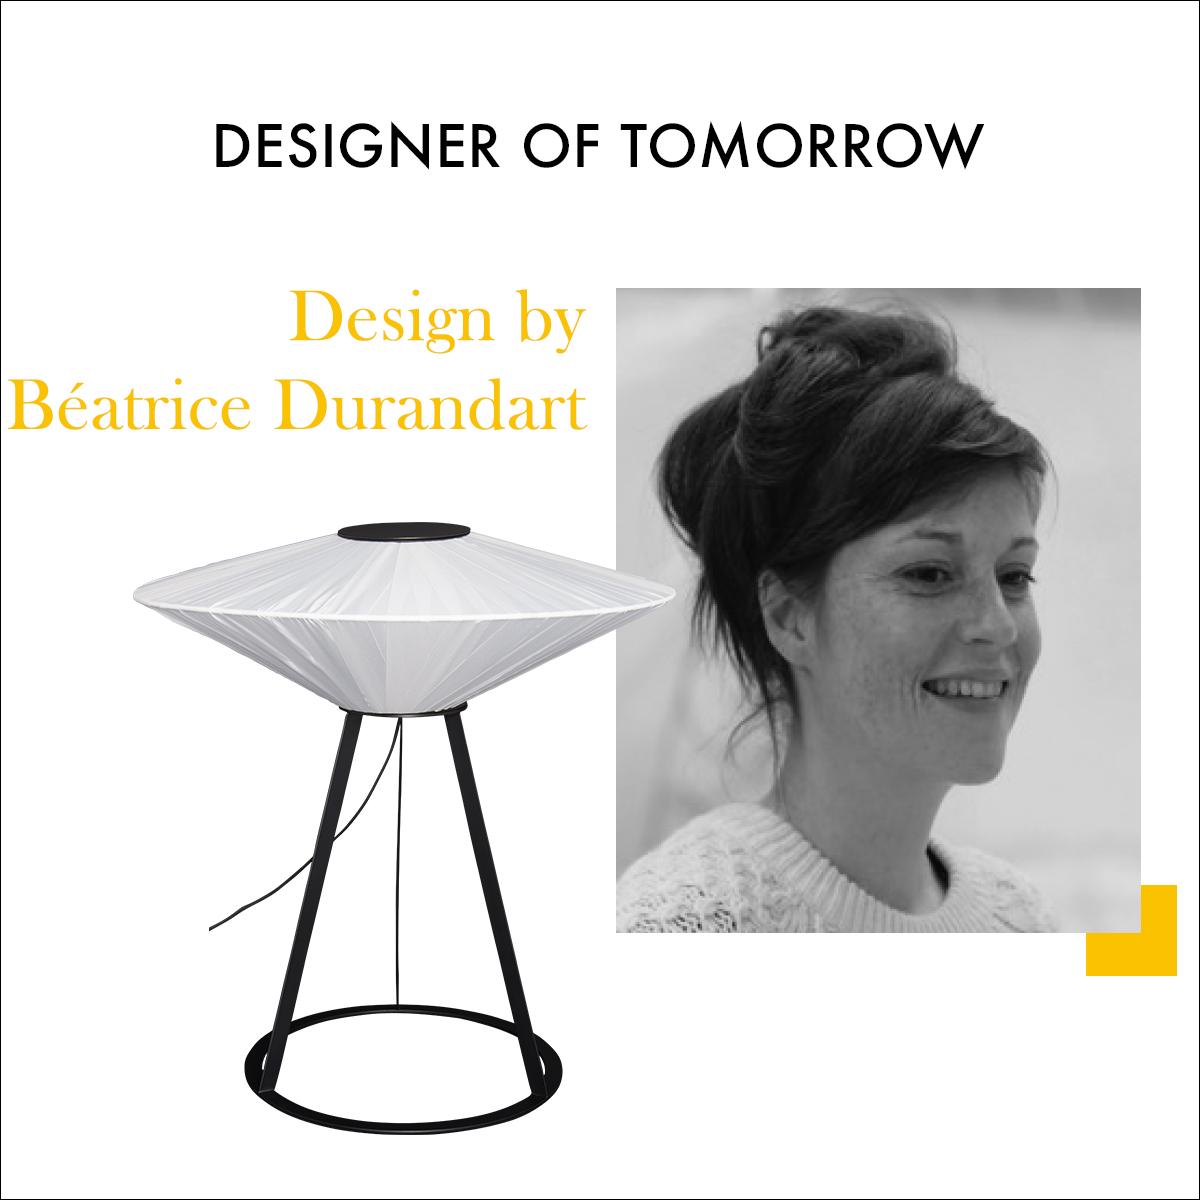 Béatrice Durandart